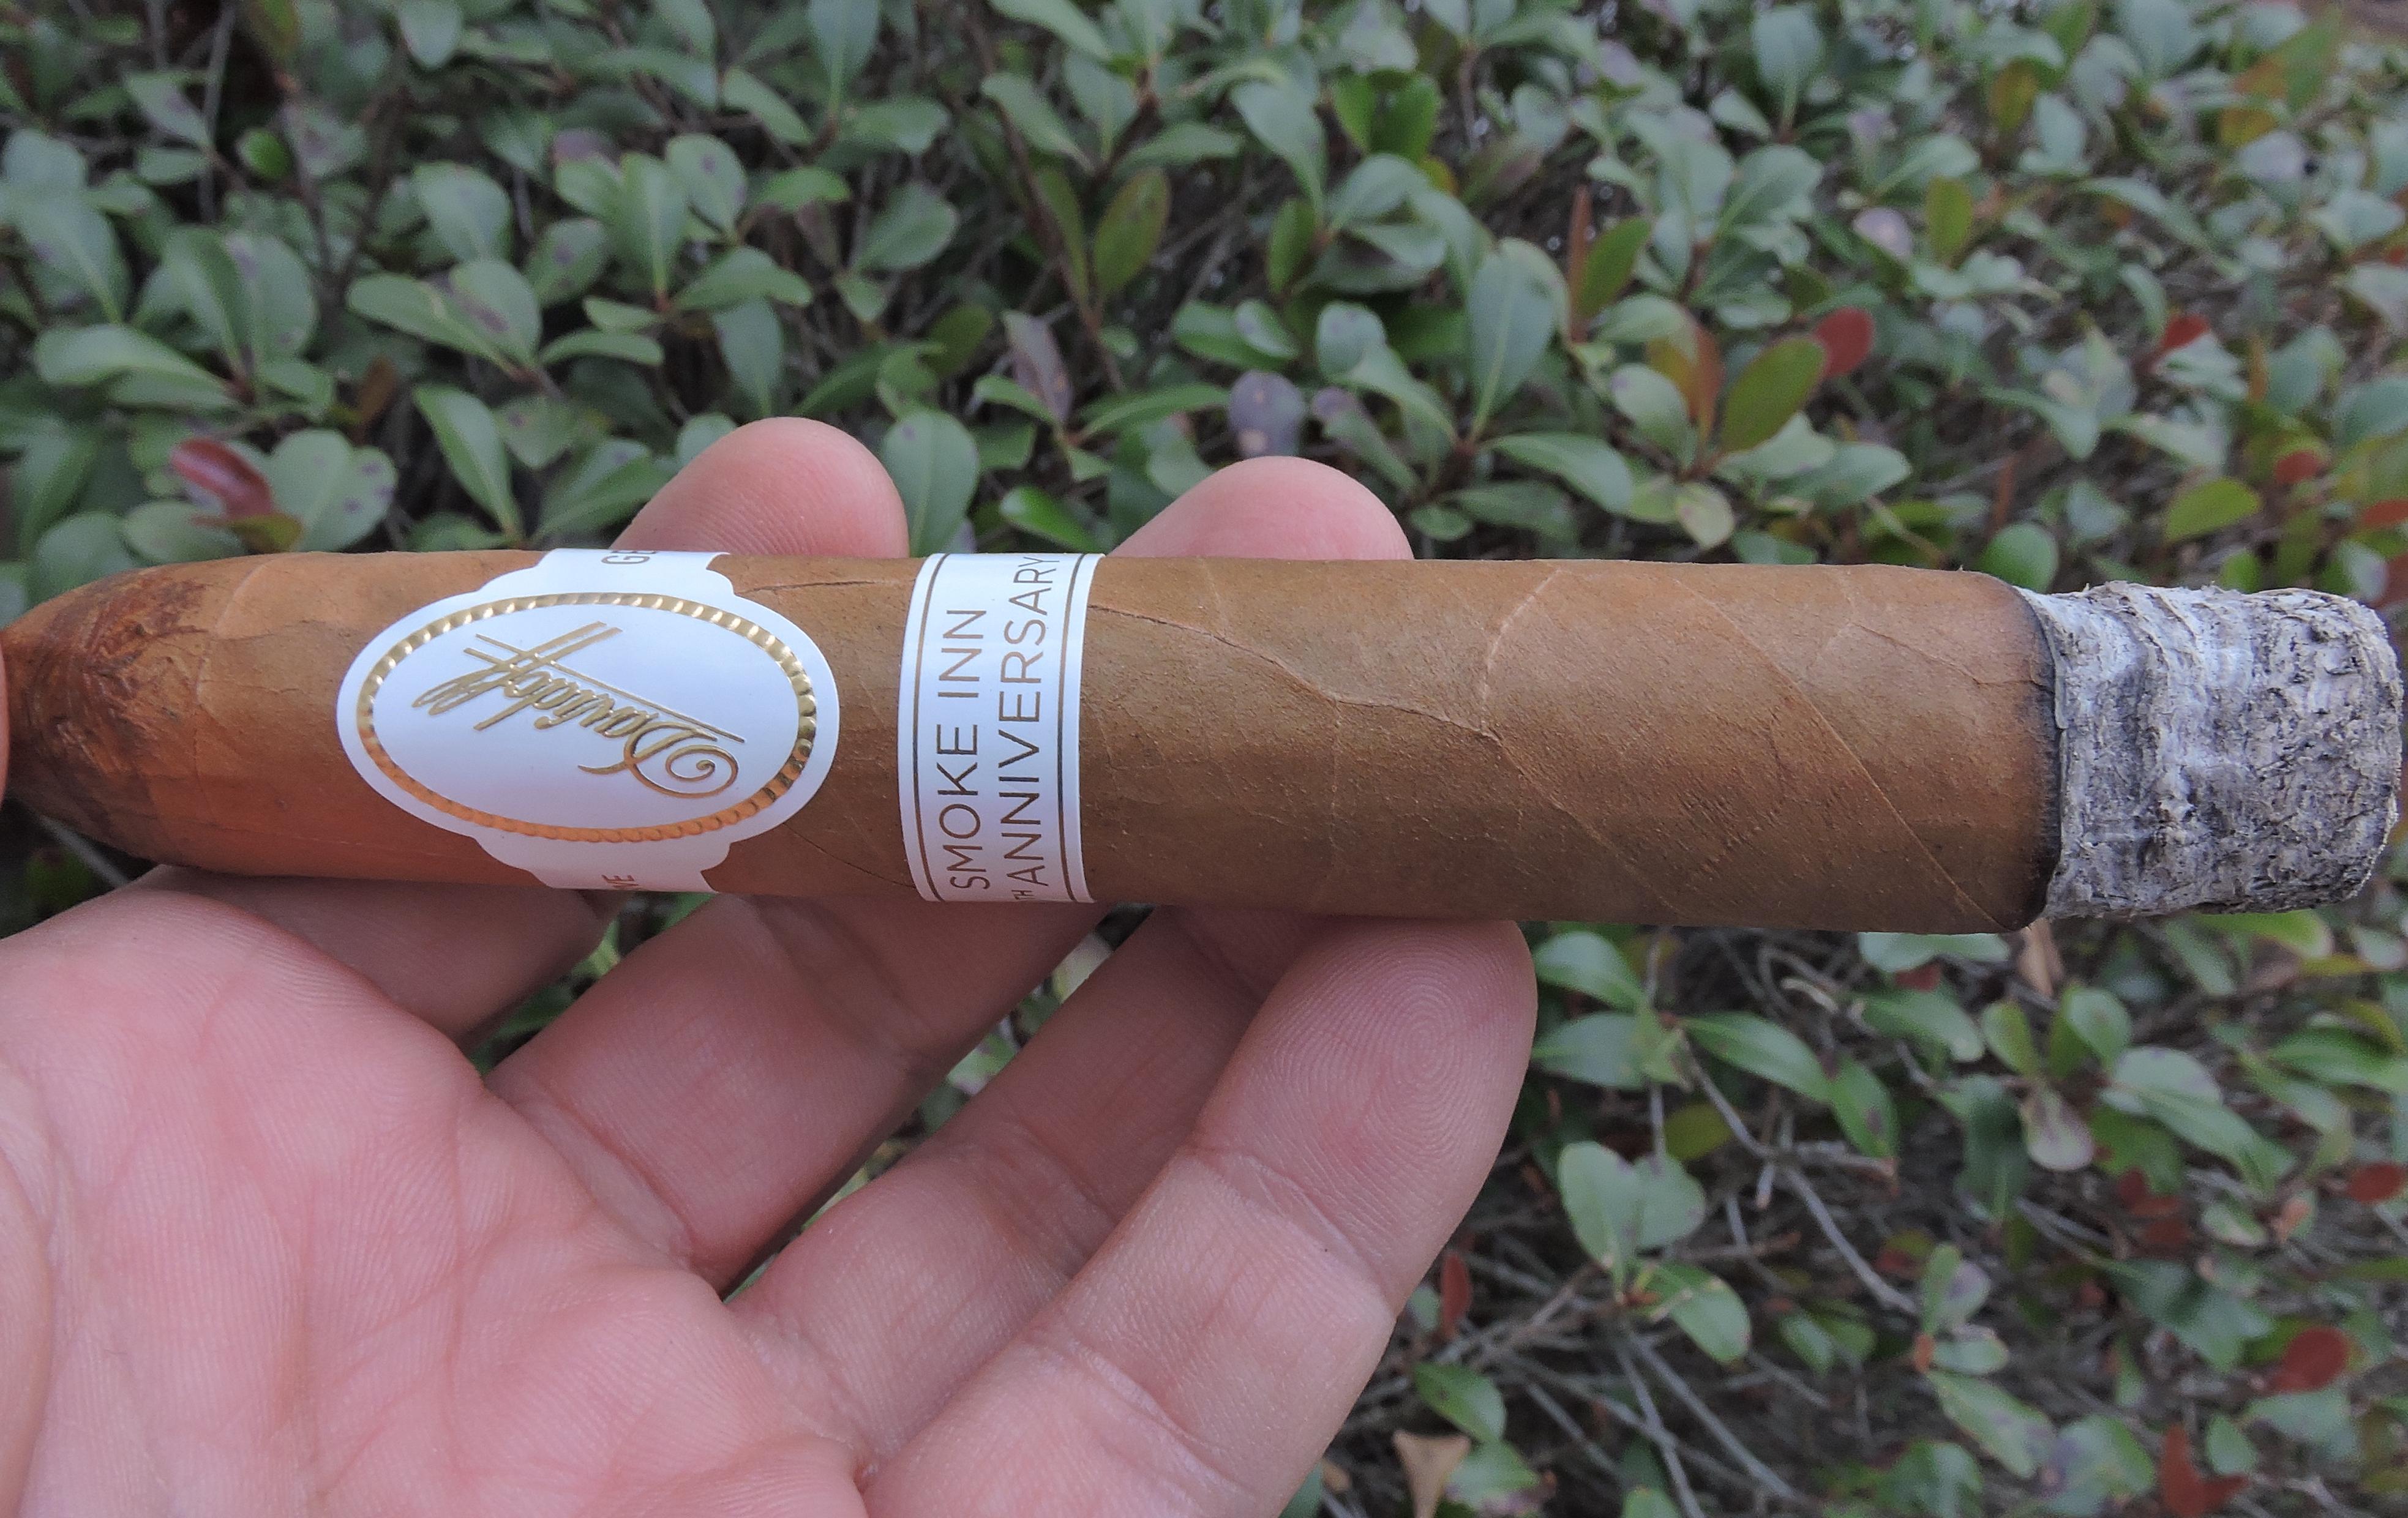 smoke_inn_20th_anniversary_by_davidoff-burnjpg